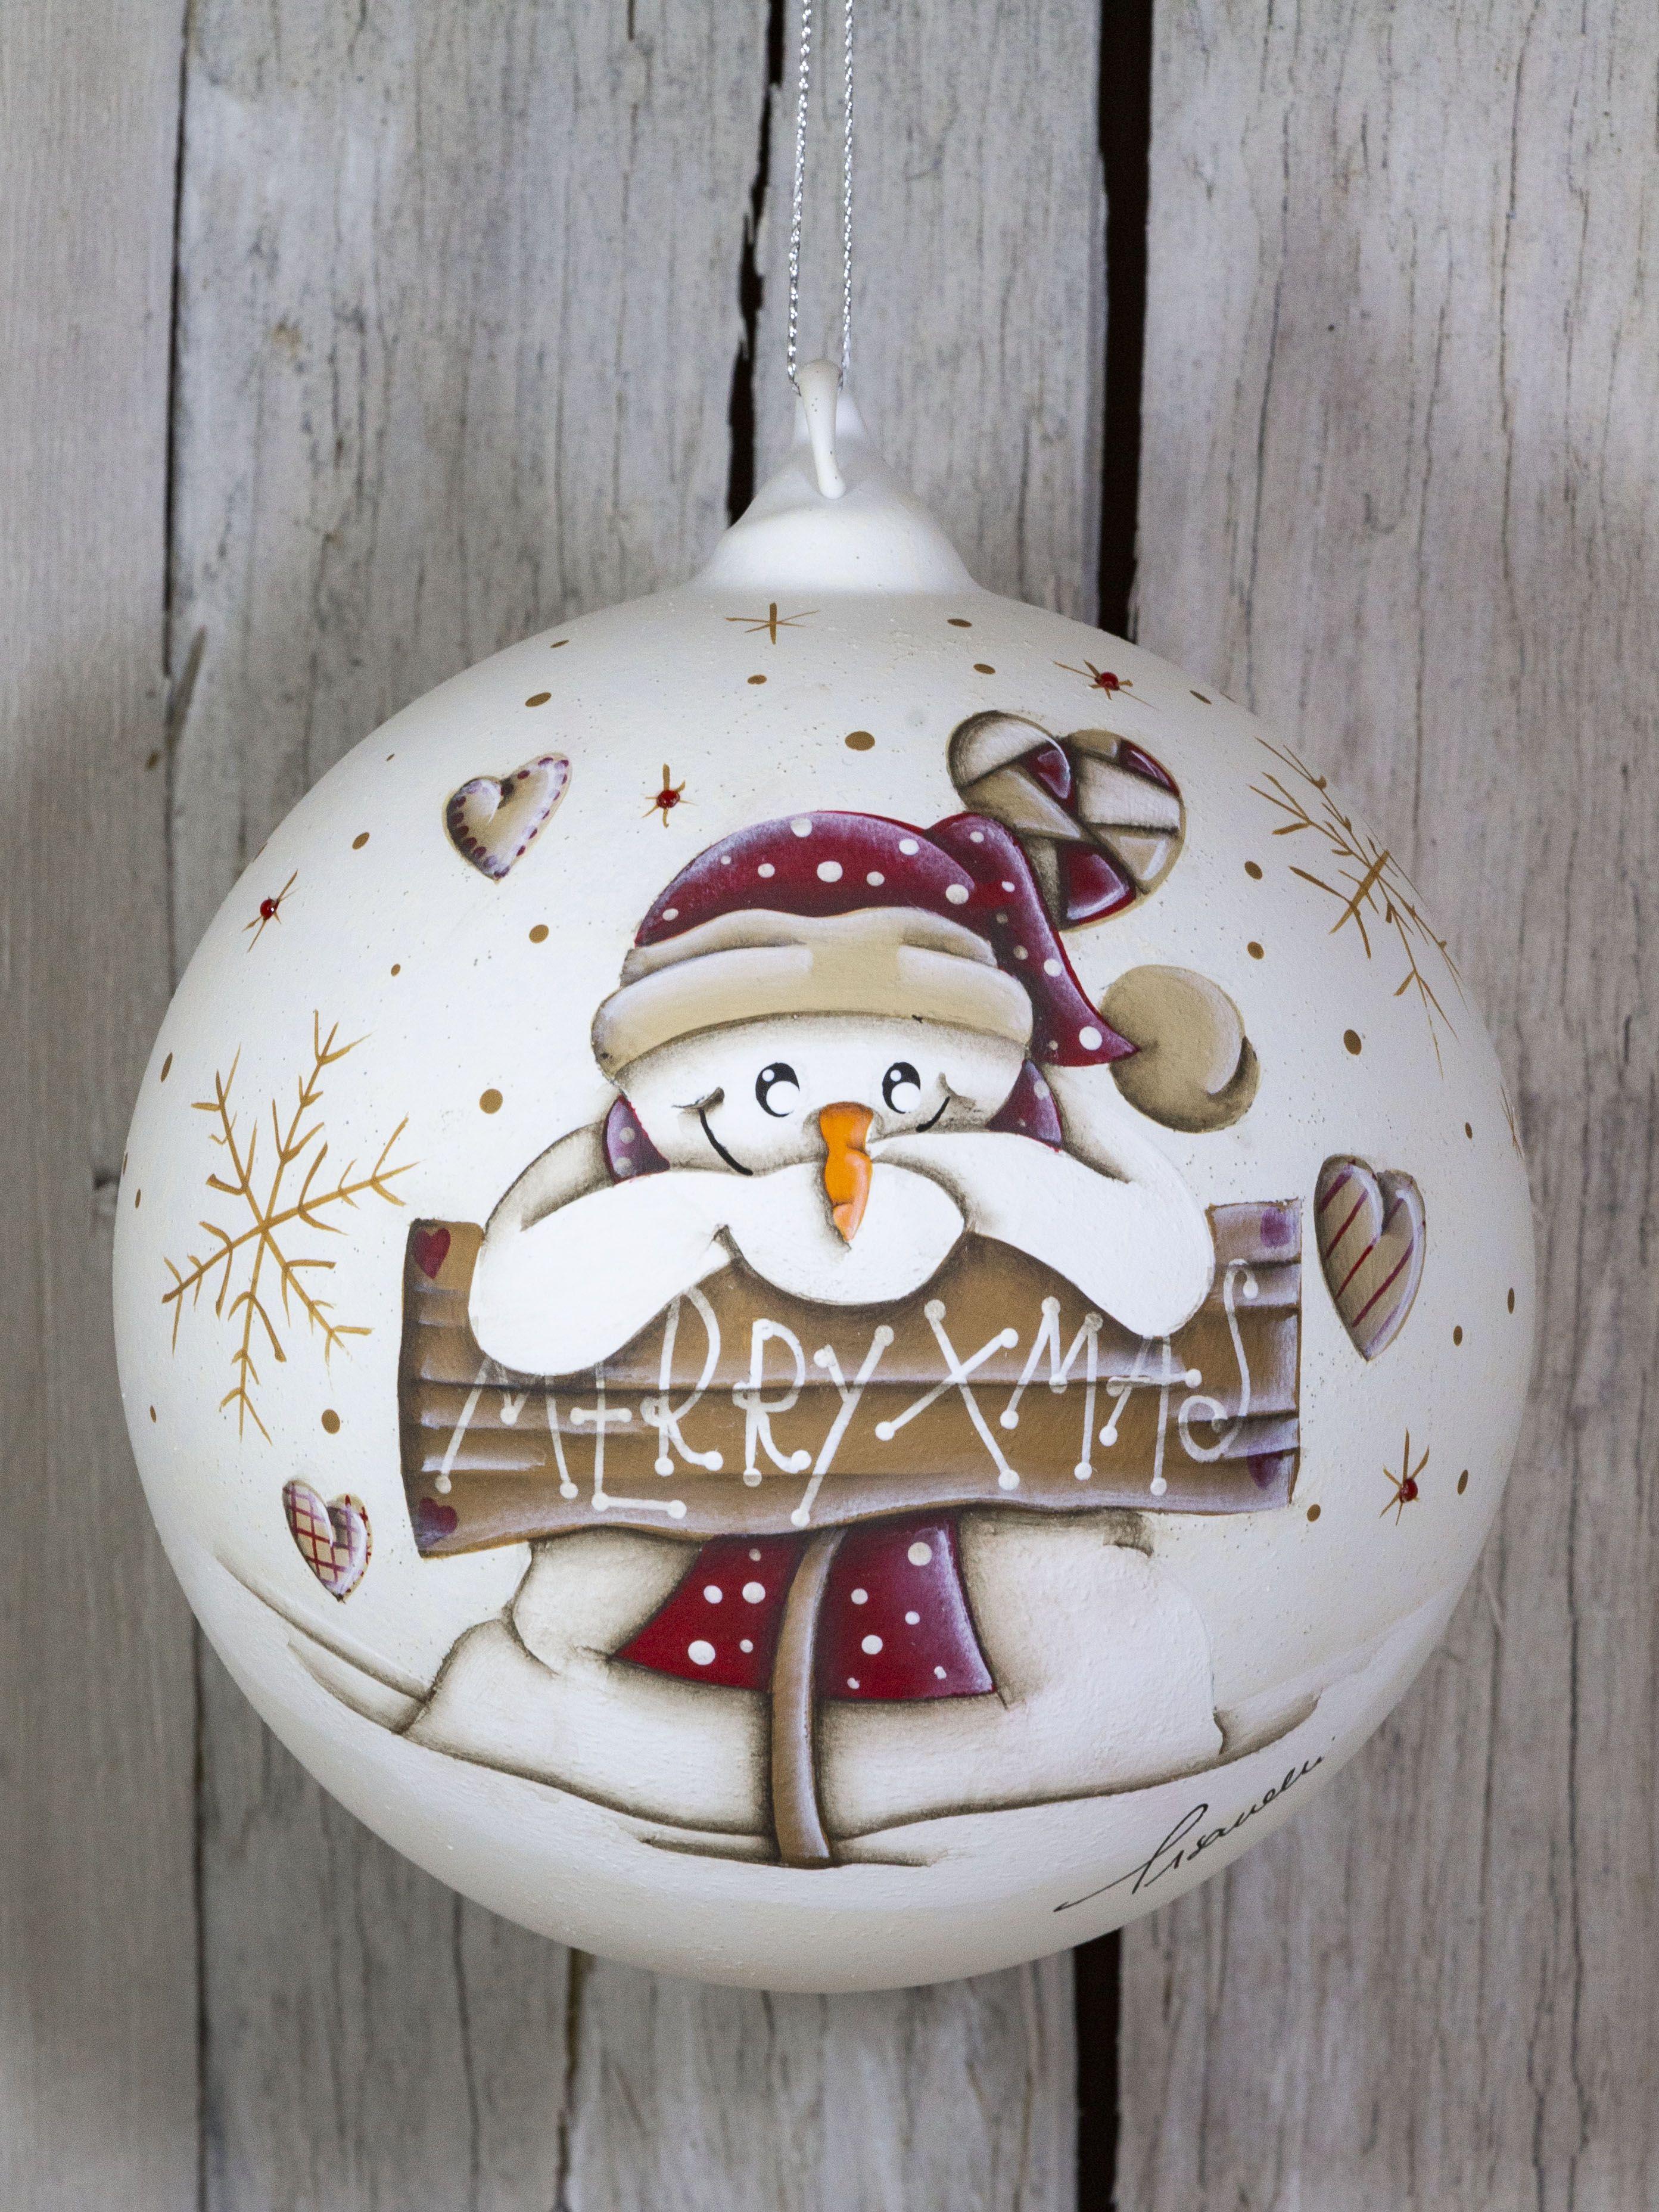 Customizable Glass Ball Christmas Glass Ornaments Hand Painted Christmas Ornaments Painted In Country Painting Christmas Glass Gift In 2020 Hand Painted Ornaments Christmas Gift Decorations Glass Christmas Ornaments